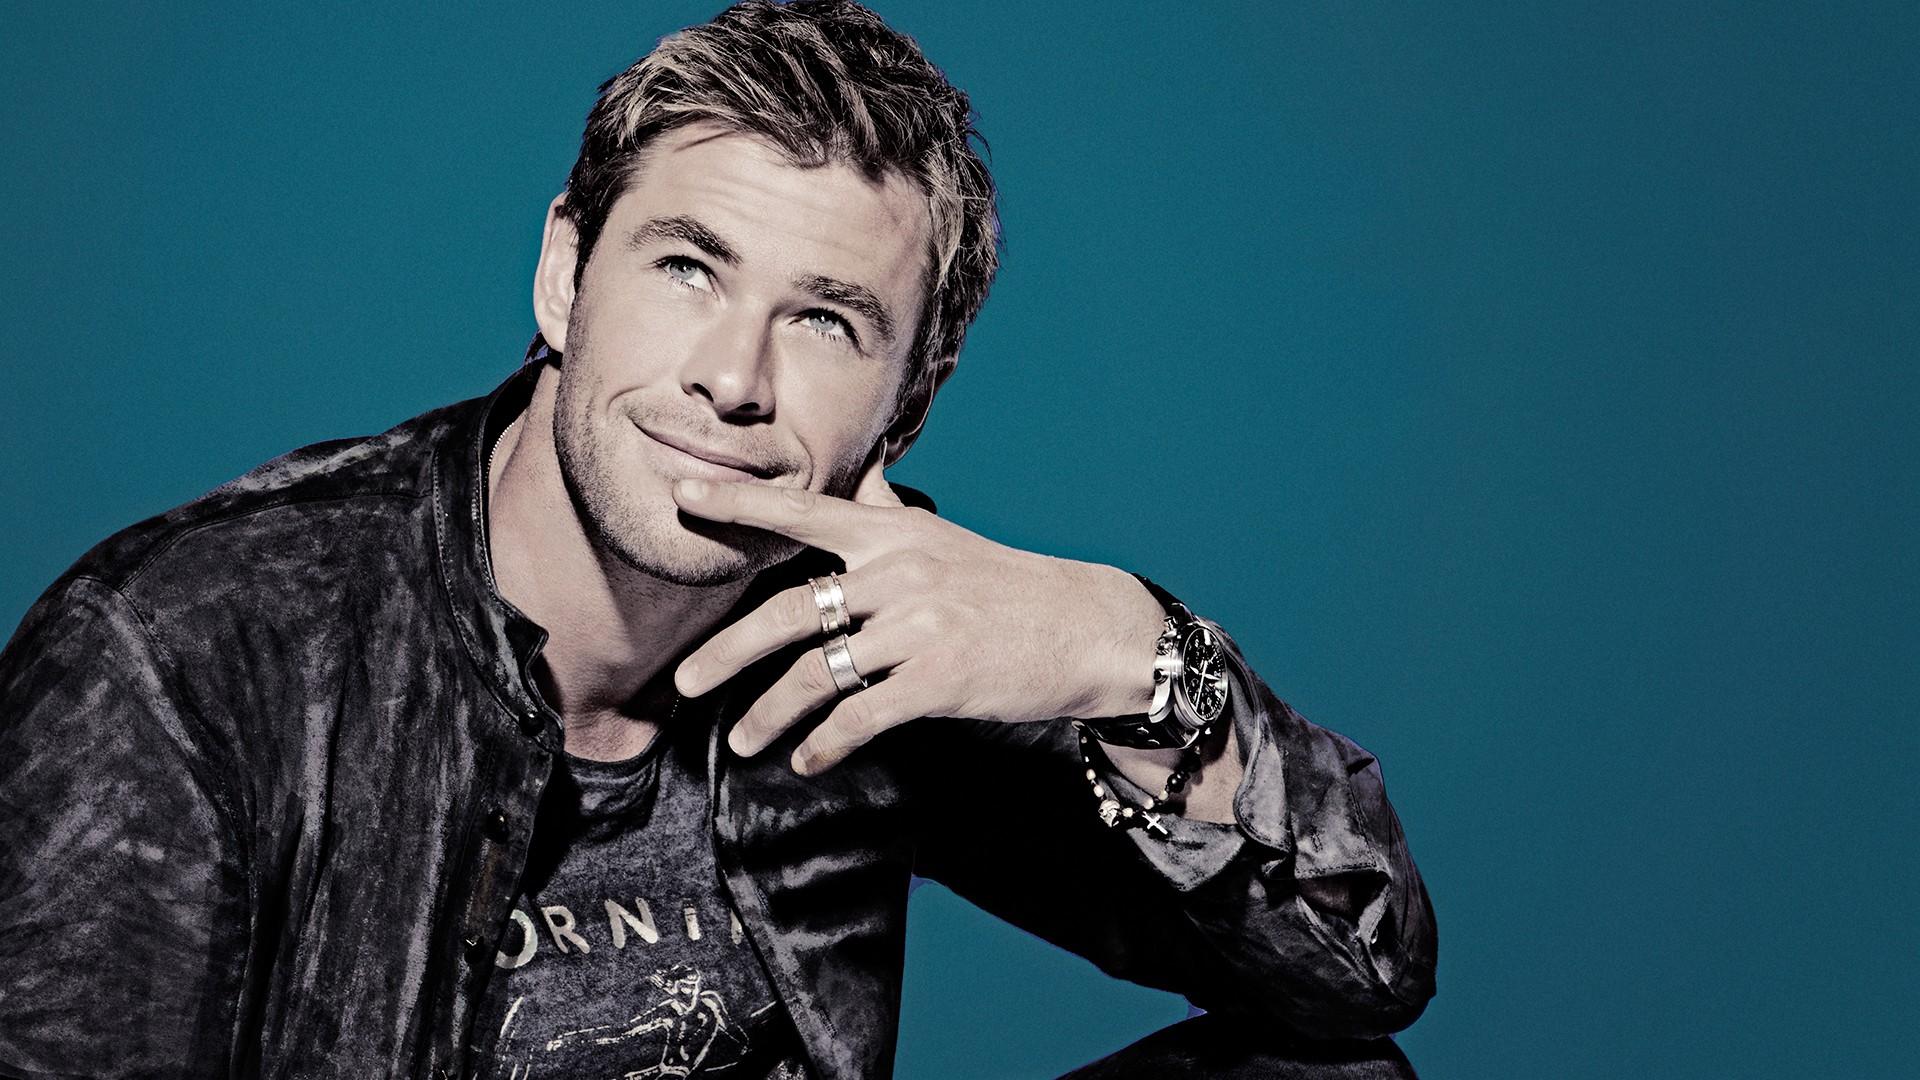 Chris Hemsworth Background Wallpaper